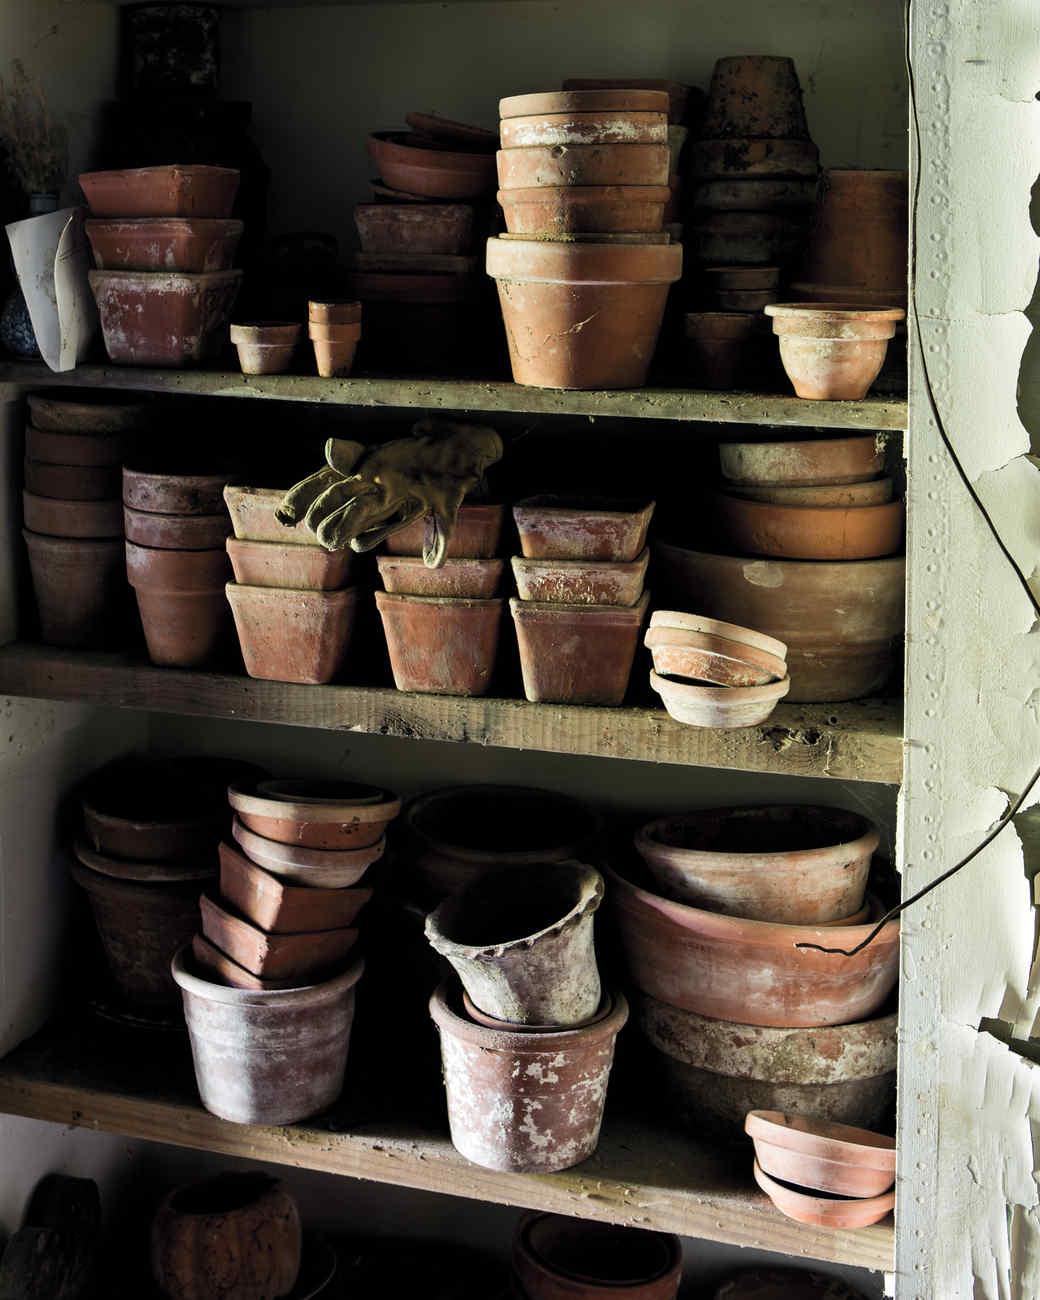 terra-cotta-pots-hollister-house-8857-edit-md109020.jpg